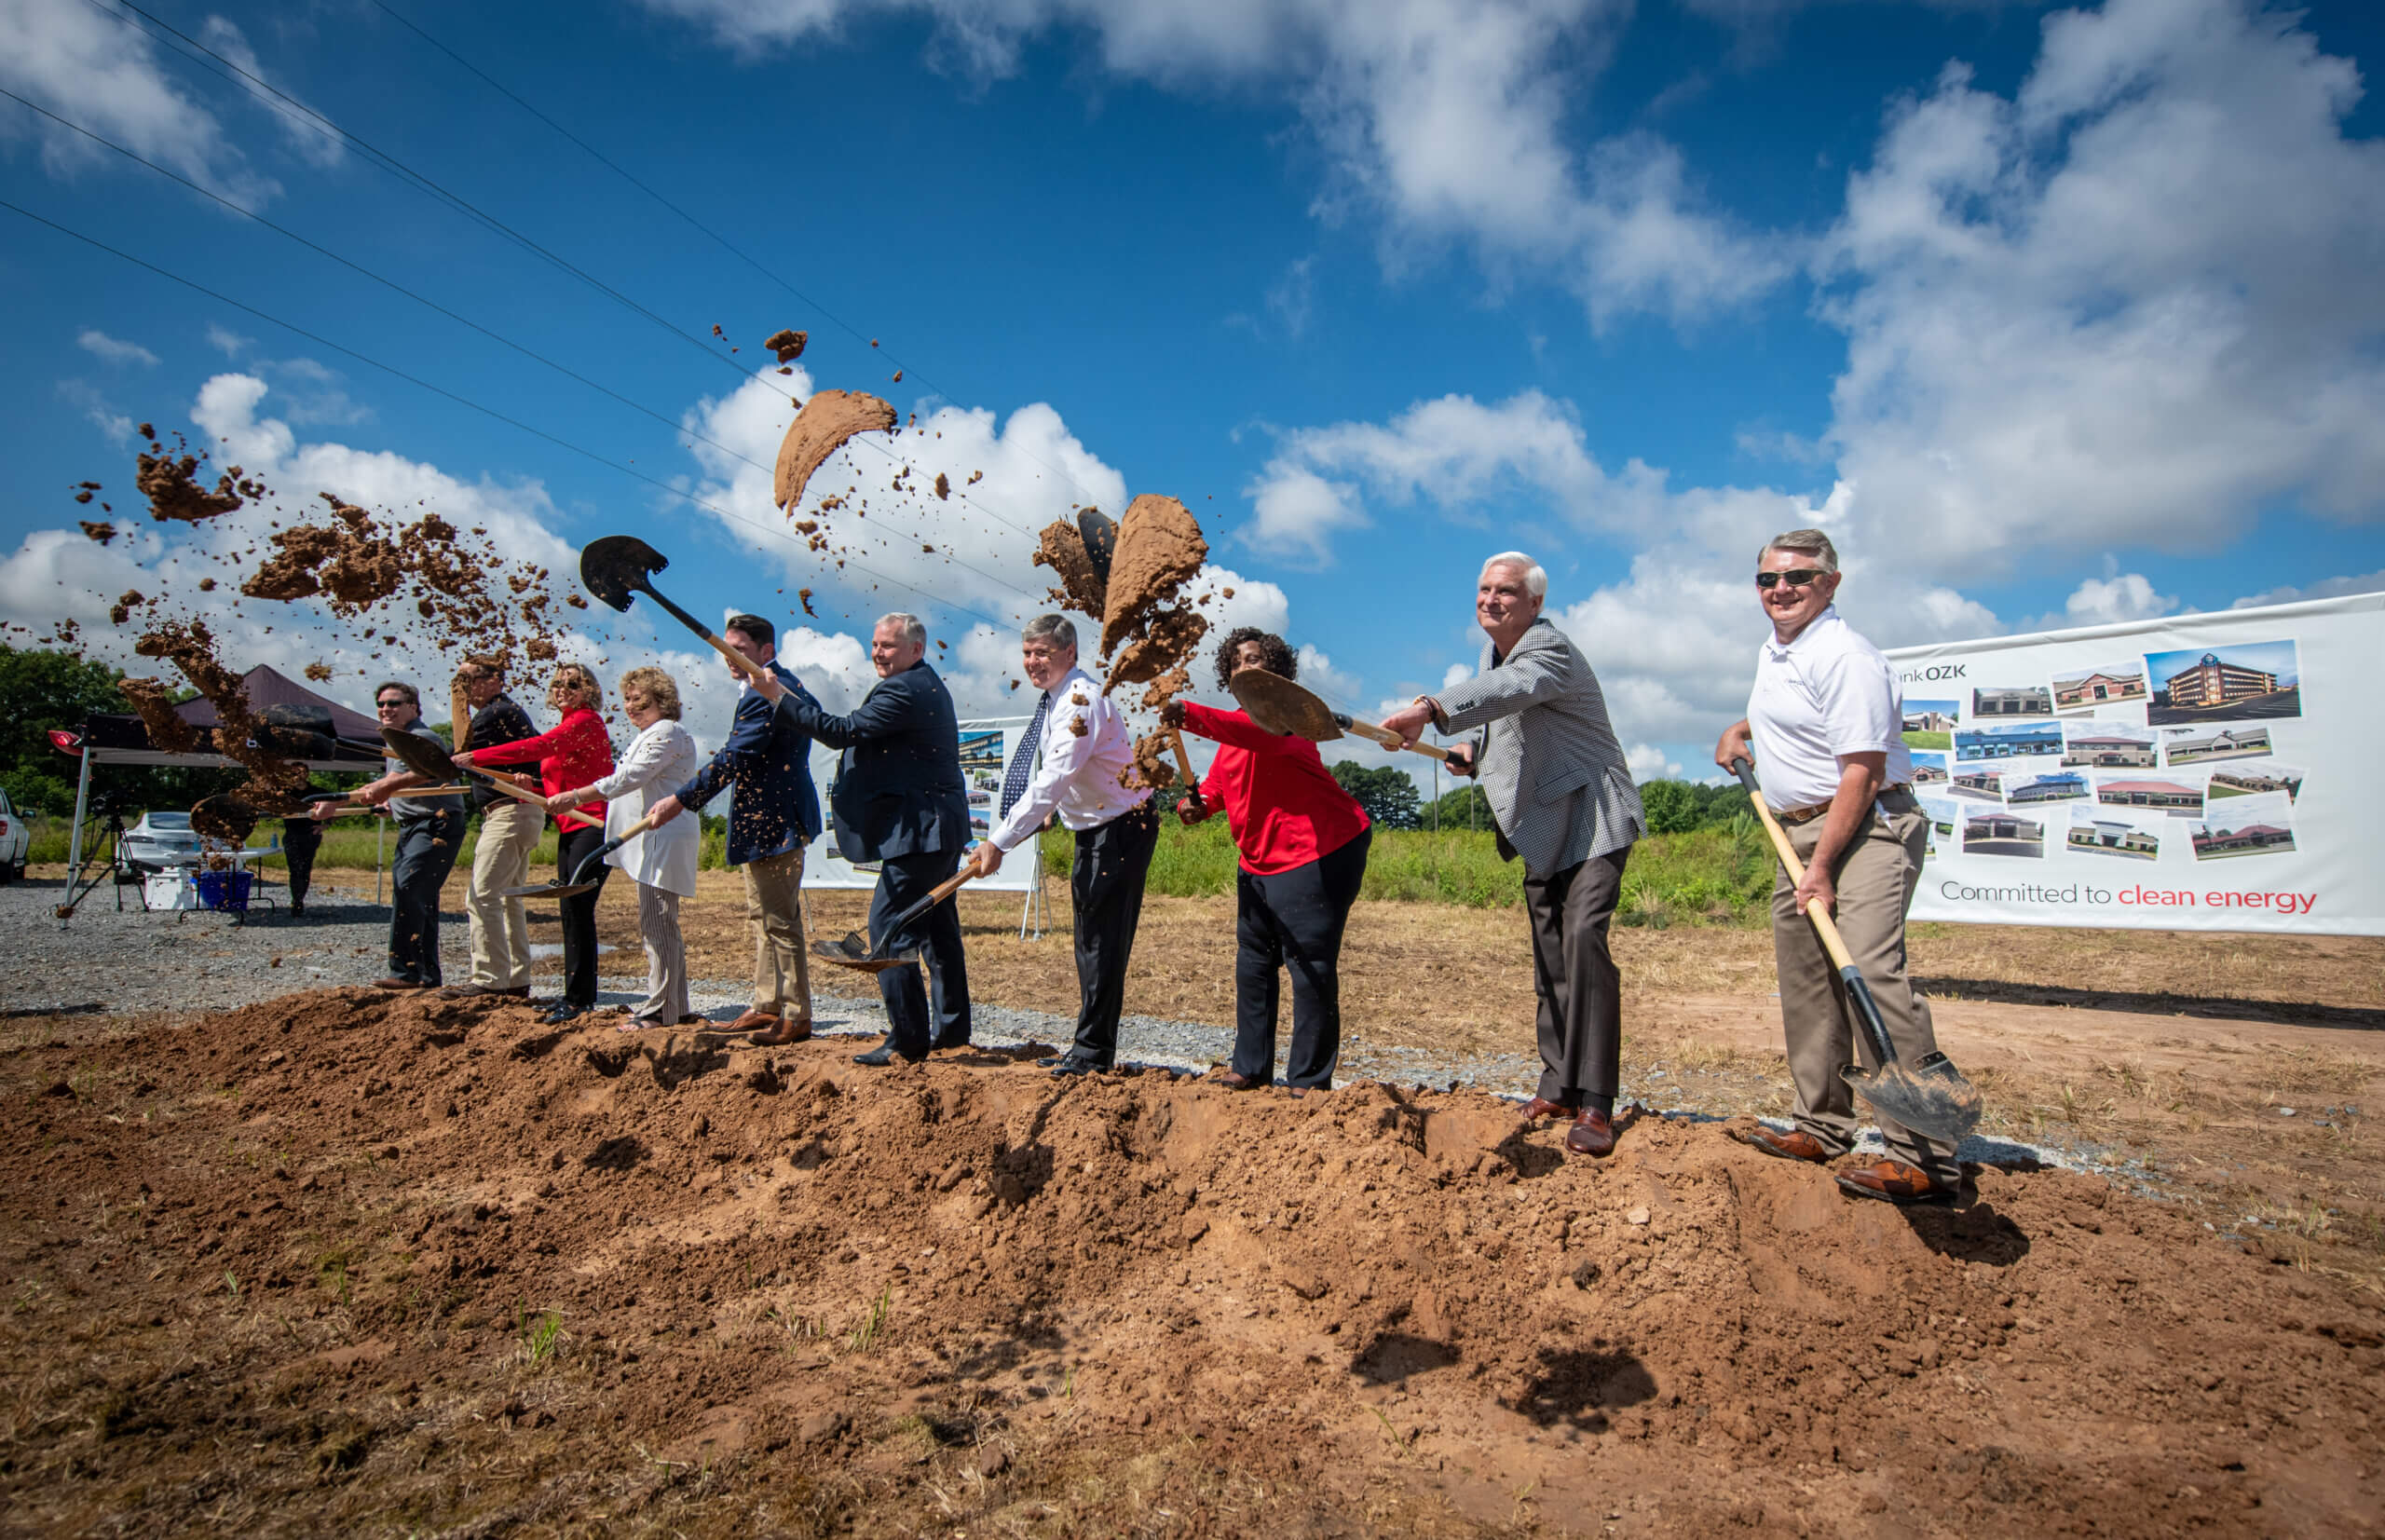 Bank OZK begins construction of the Arkansas solar power plant